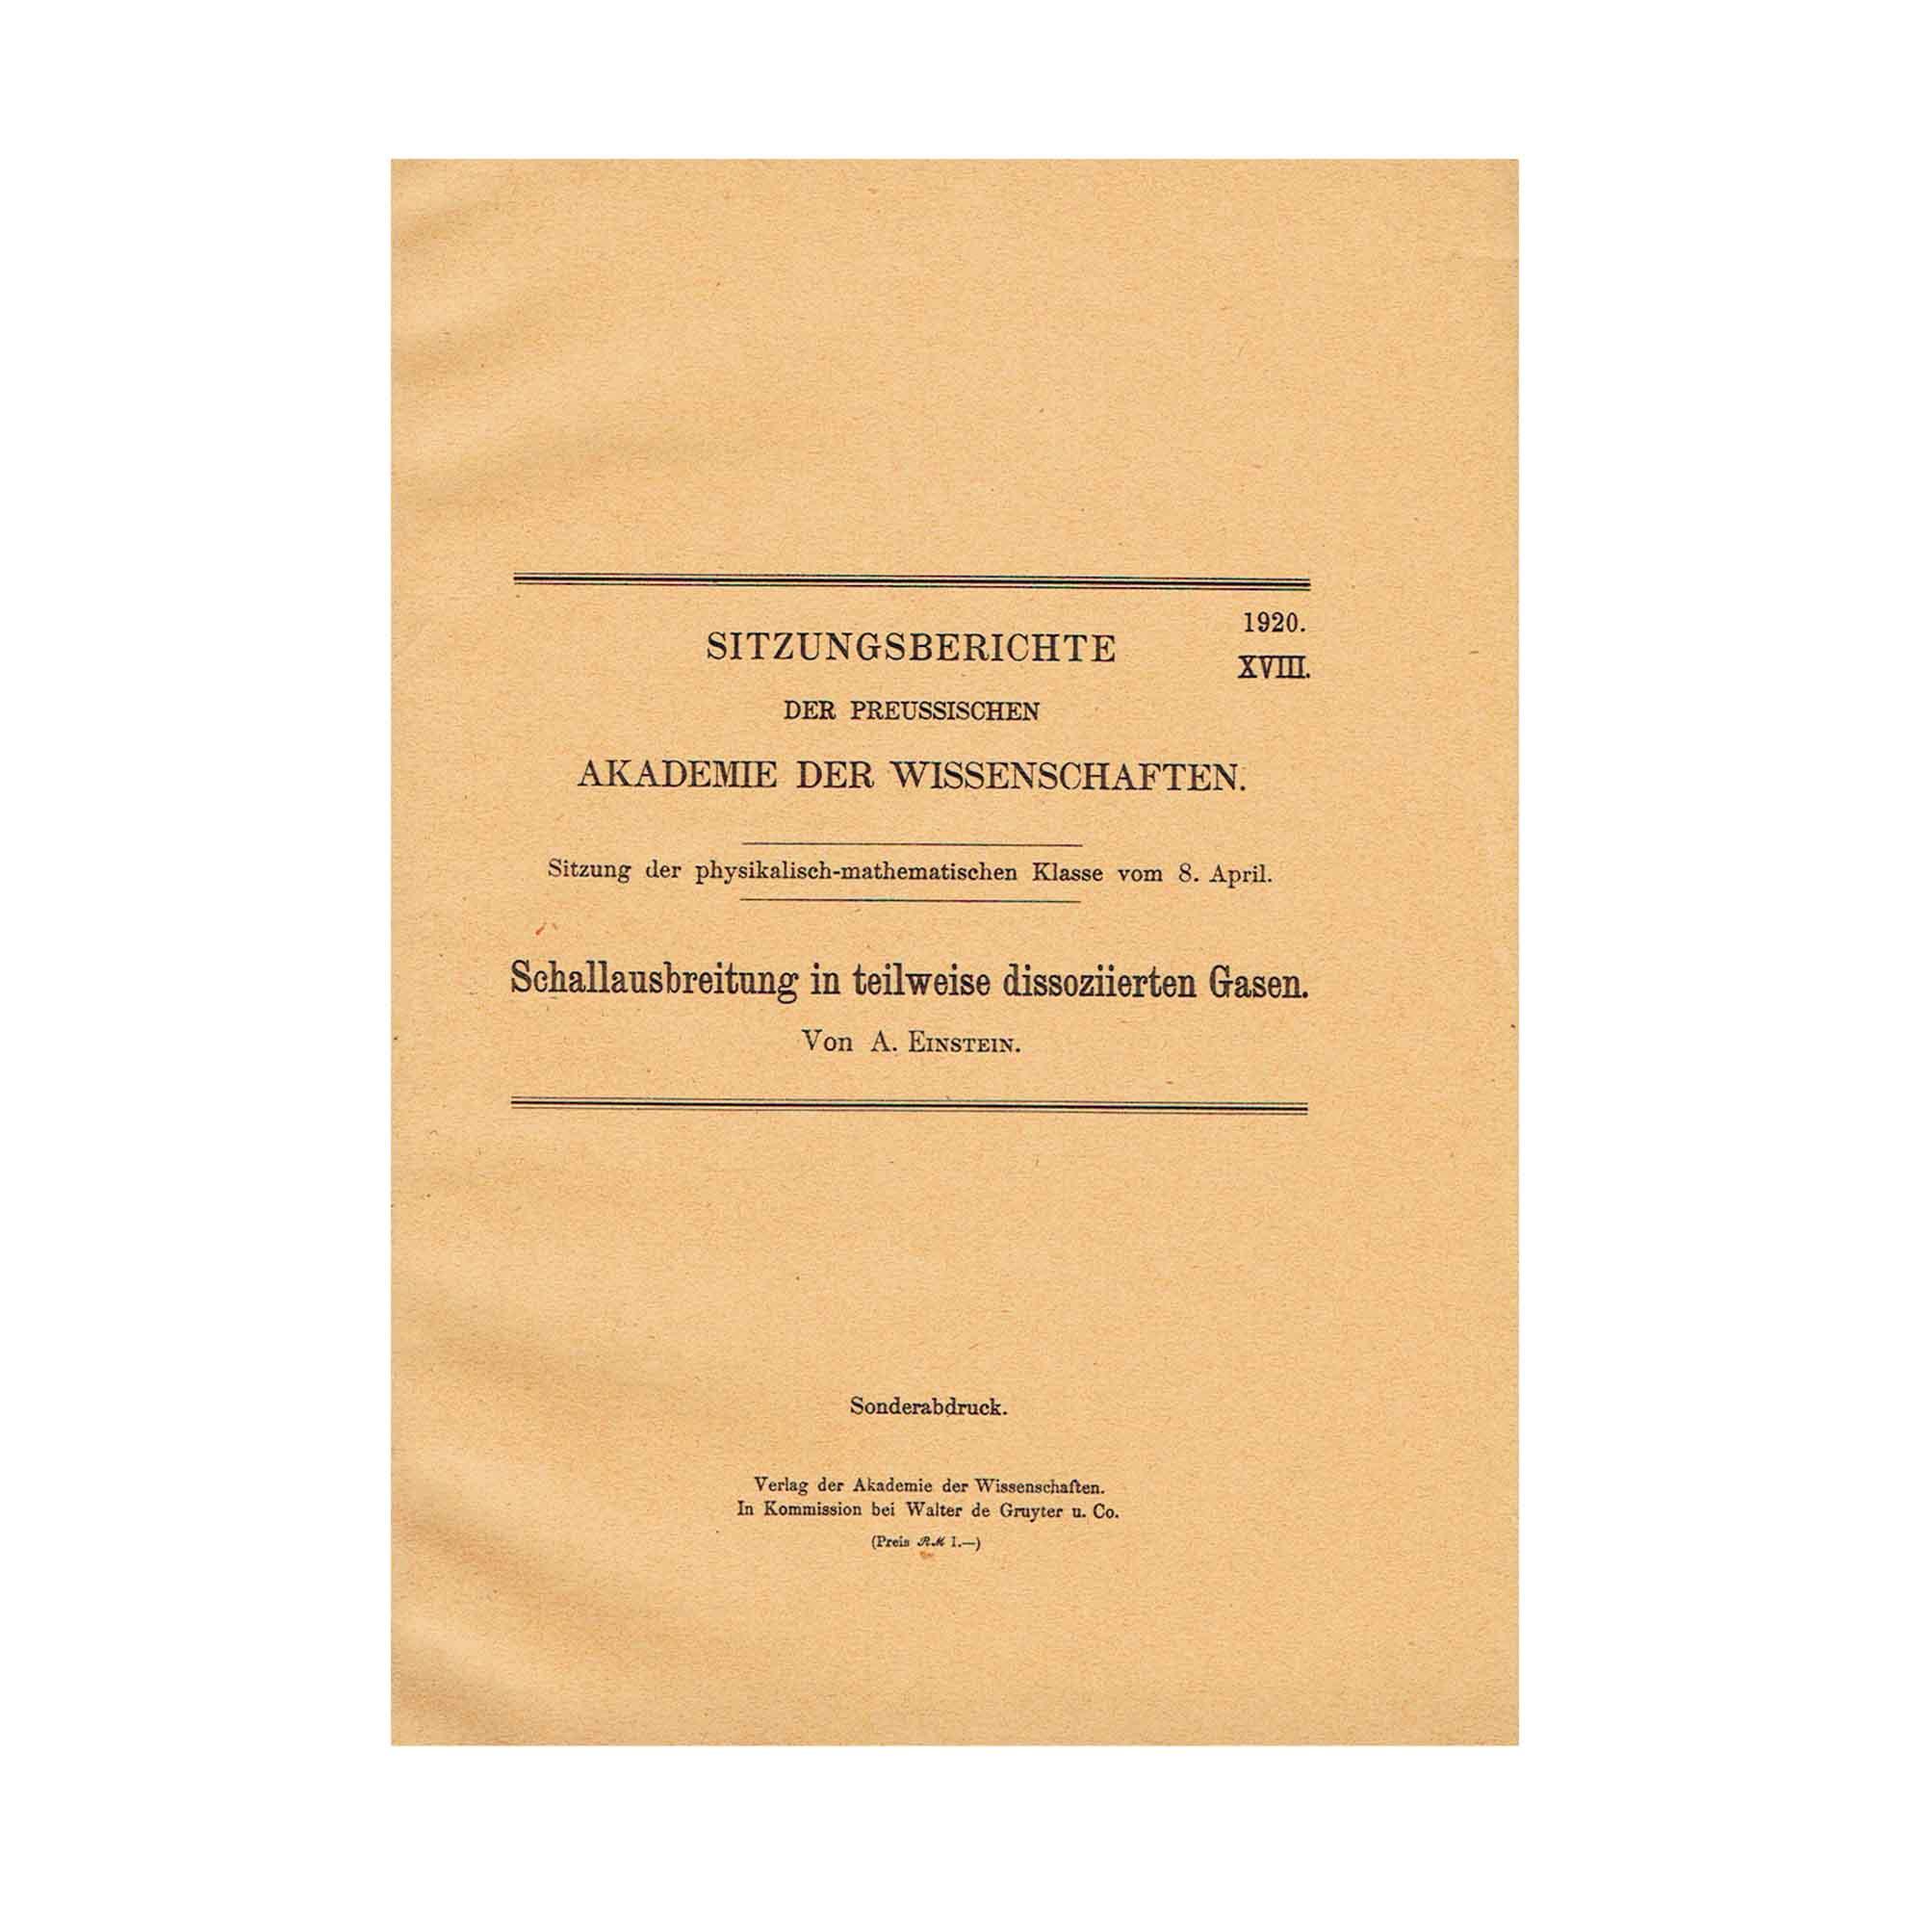 5724-Einstein-Sounds-Akademie-XVIII-1920-SA-Cover-recto-N.jpeg